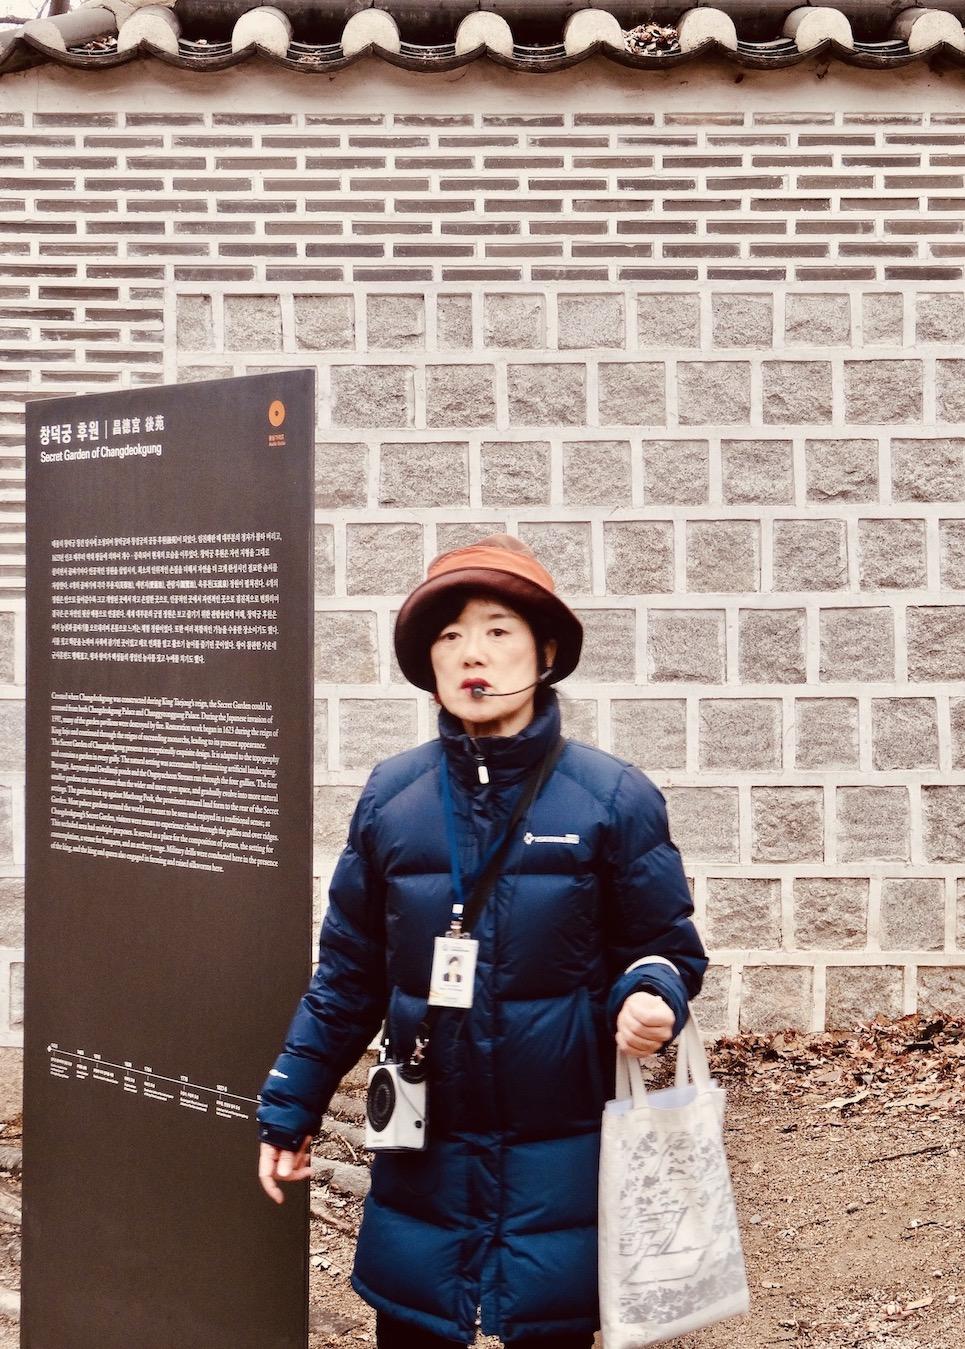 Tour guide Changdeokgung Palace.